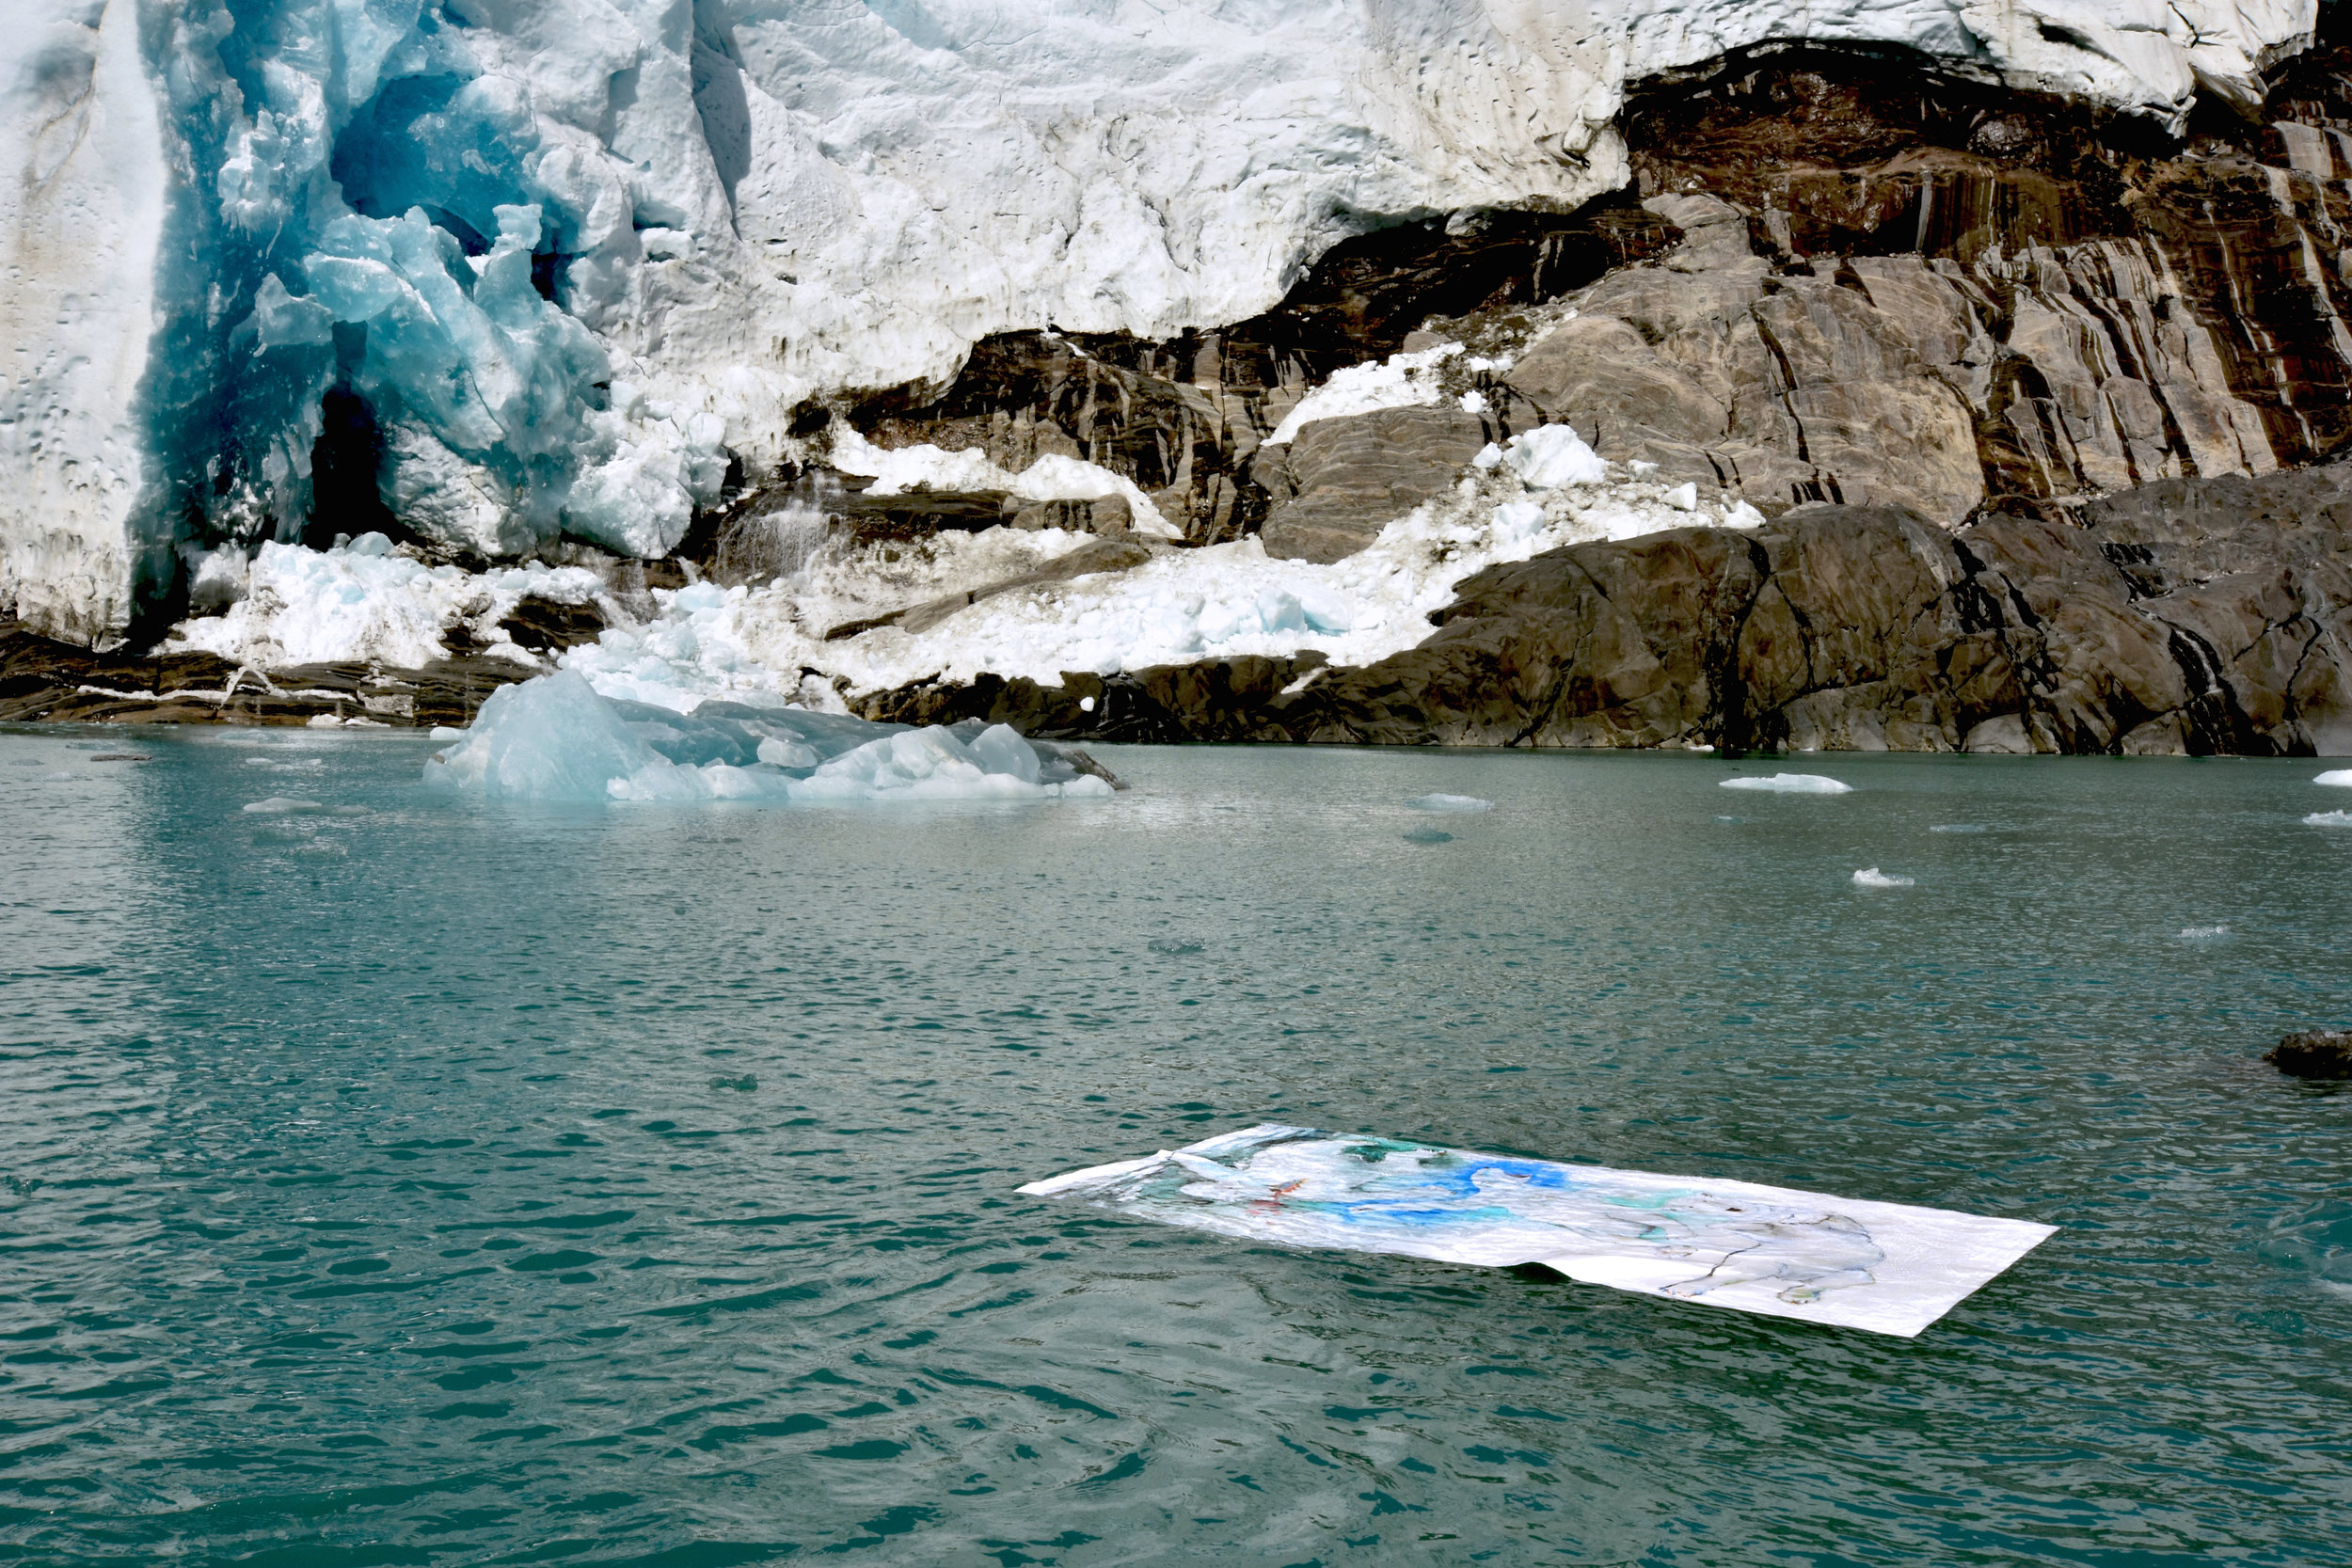 1g_Near the Glacier Serenity Bay copy.jpg